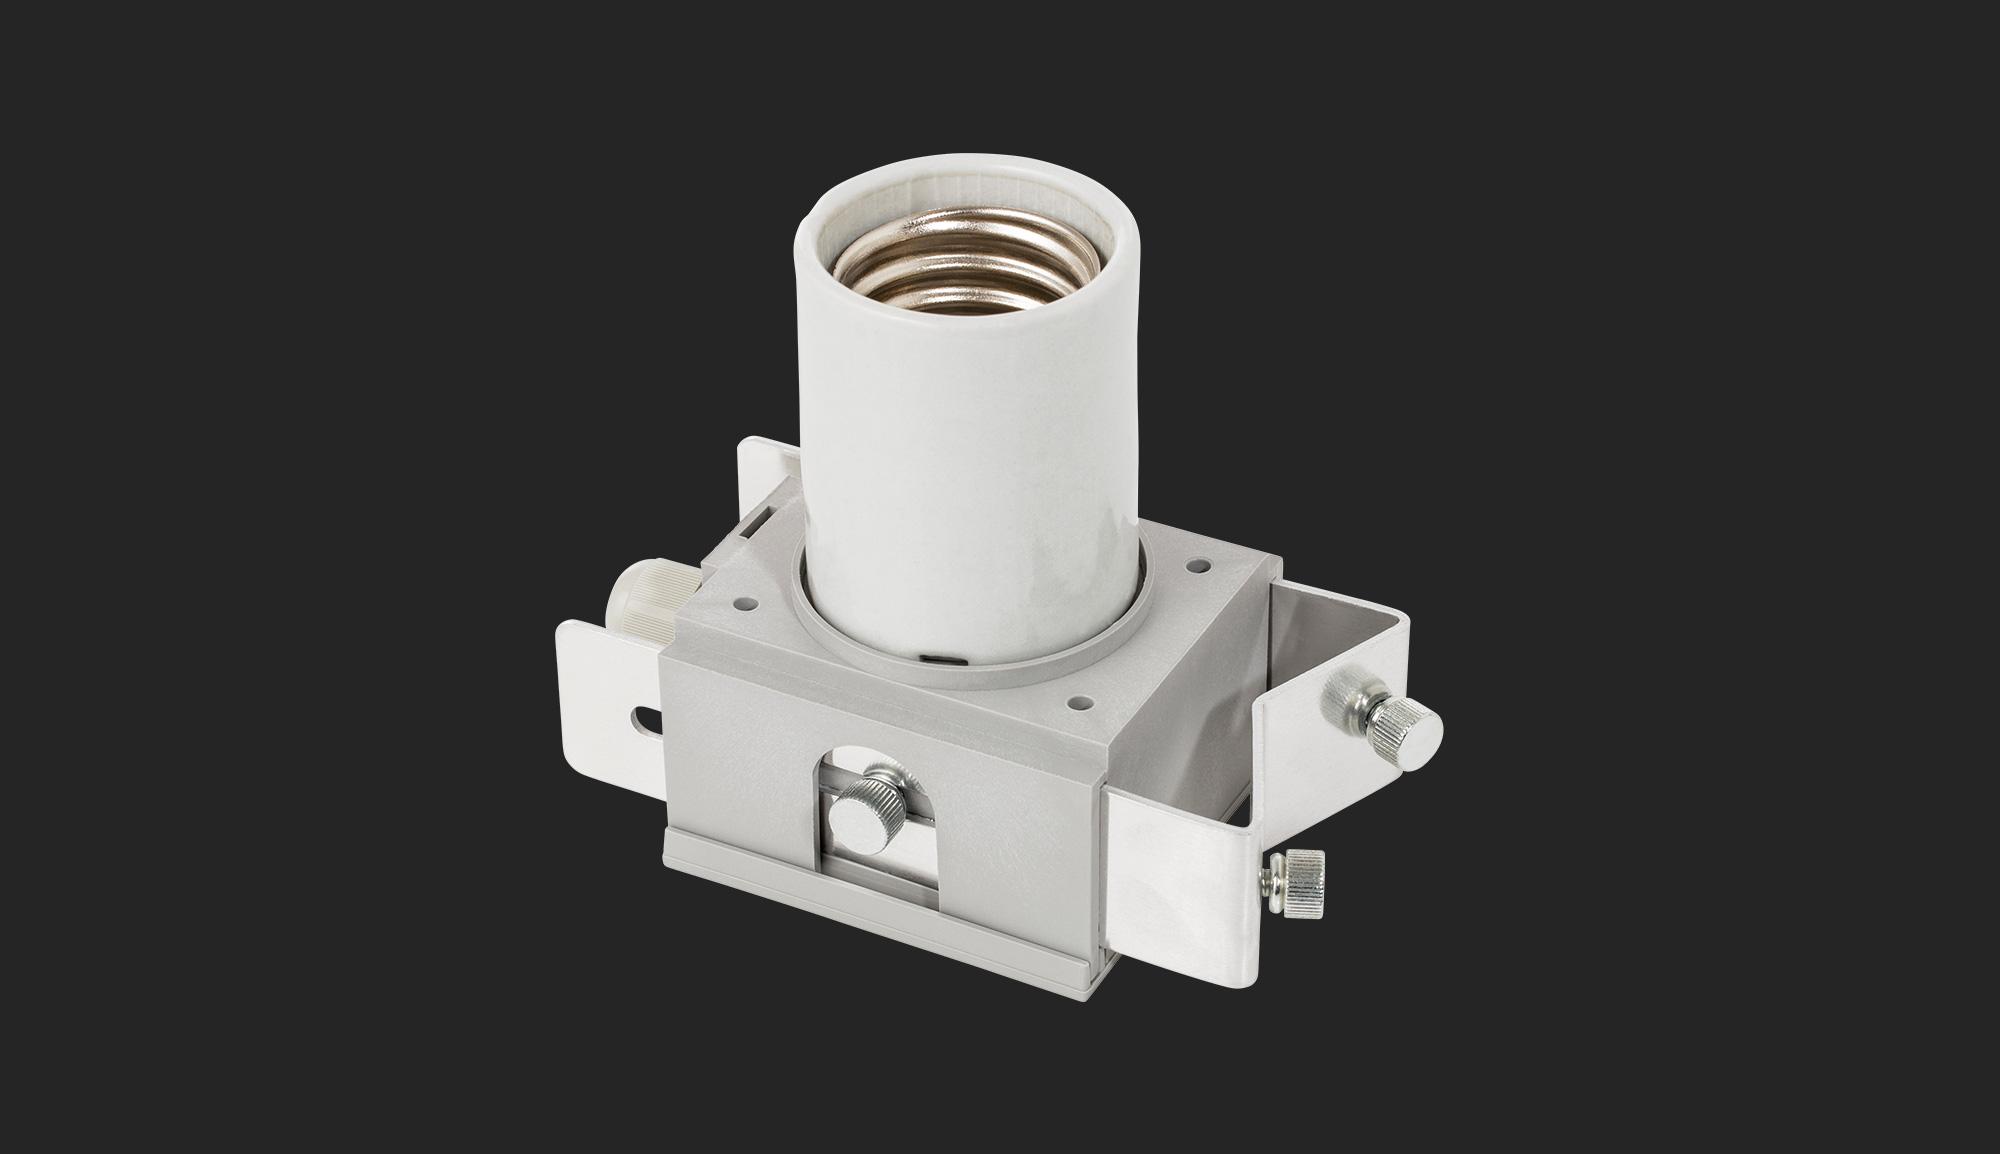 E40 Lamp Holder - Adjust-A-Wings